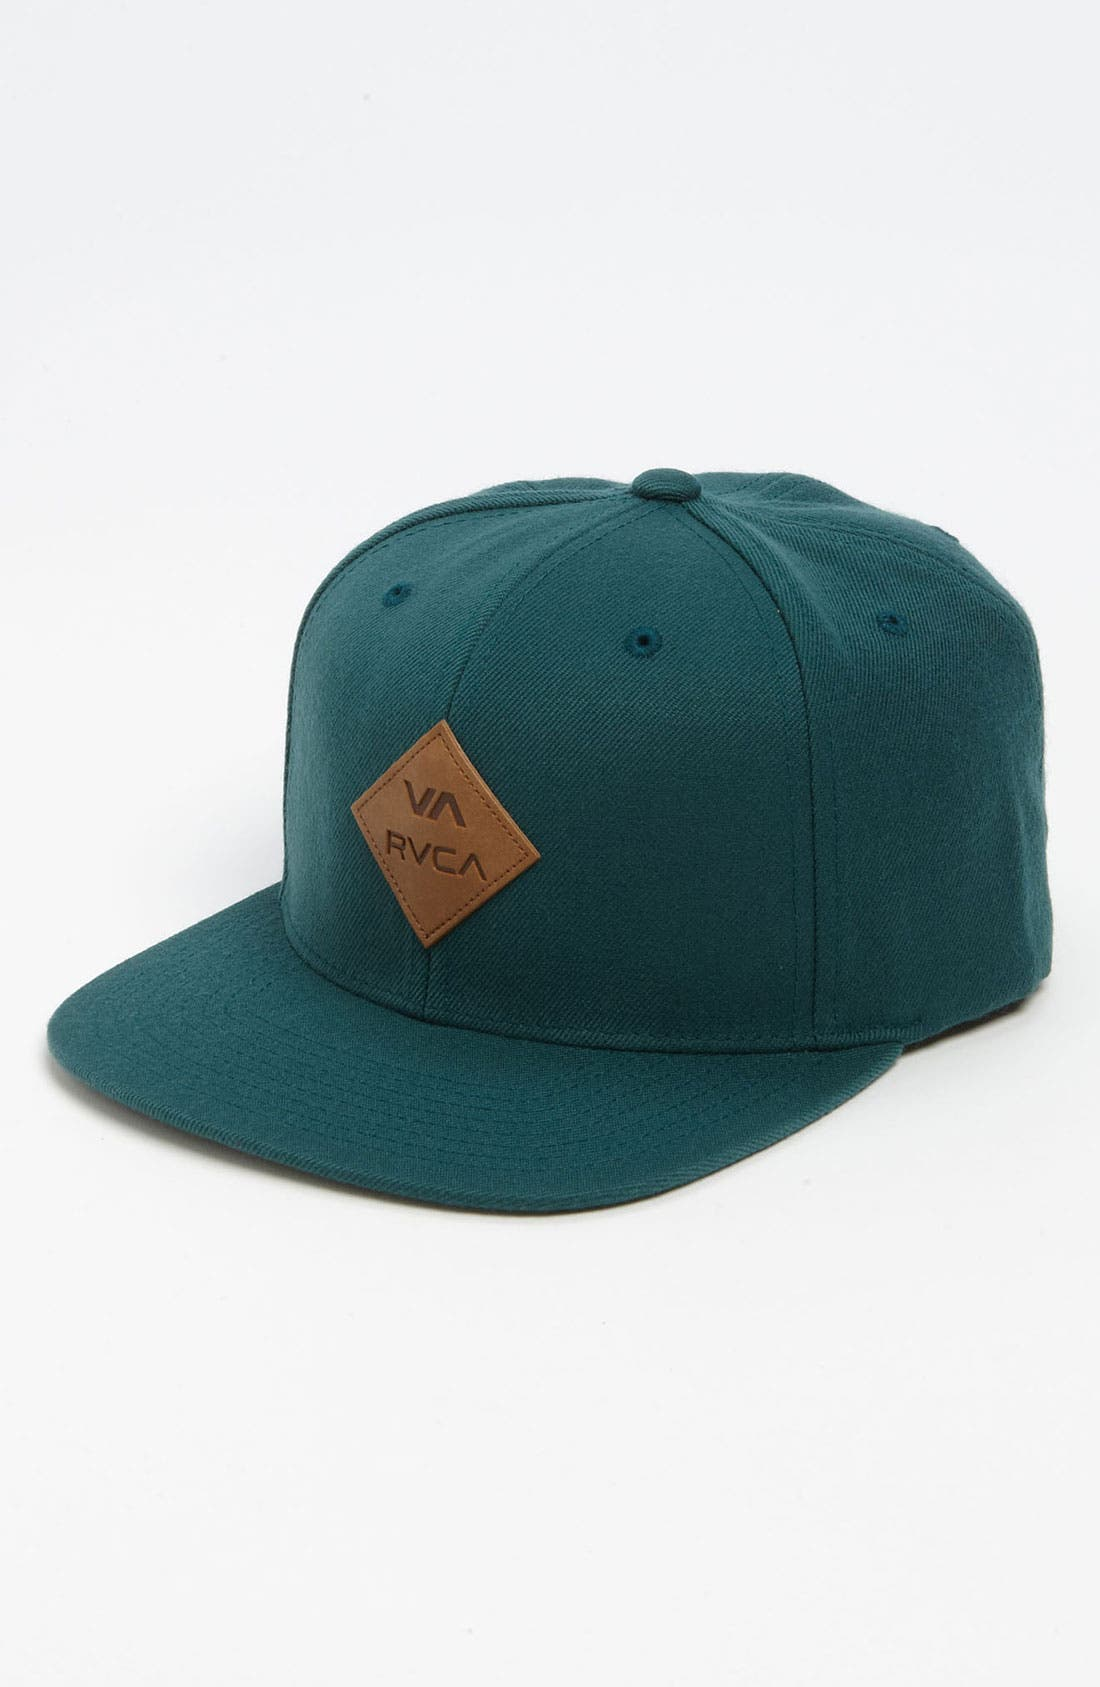 Main Image - RVCA 'Delux' Snapback Baseball Cap